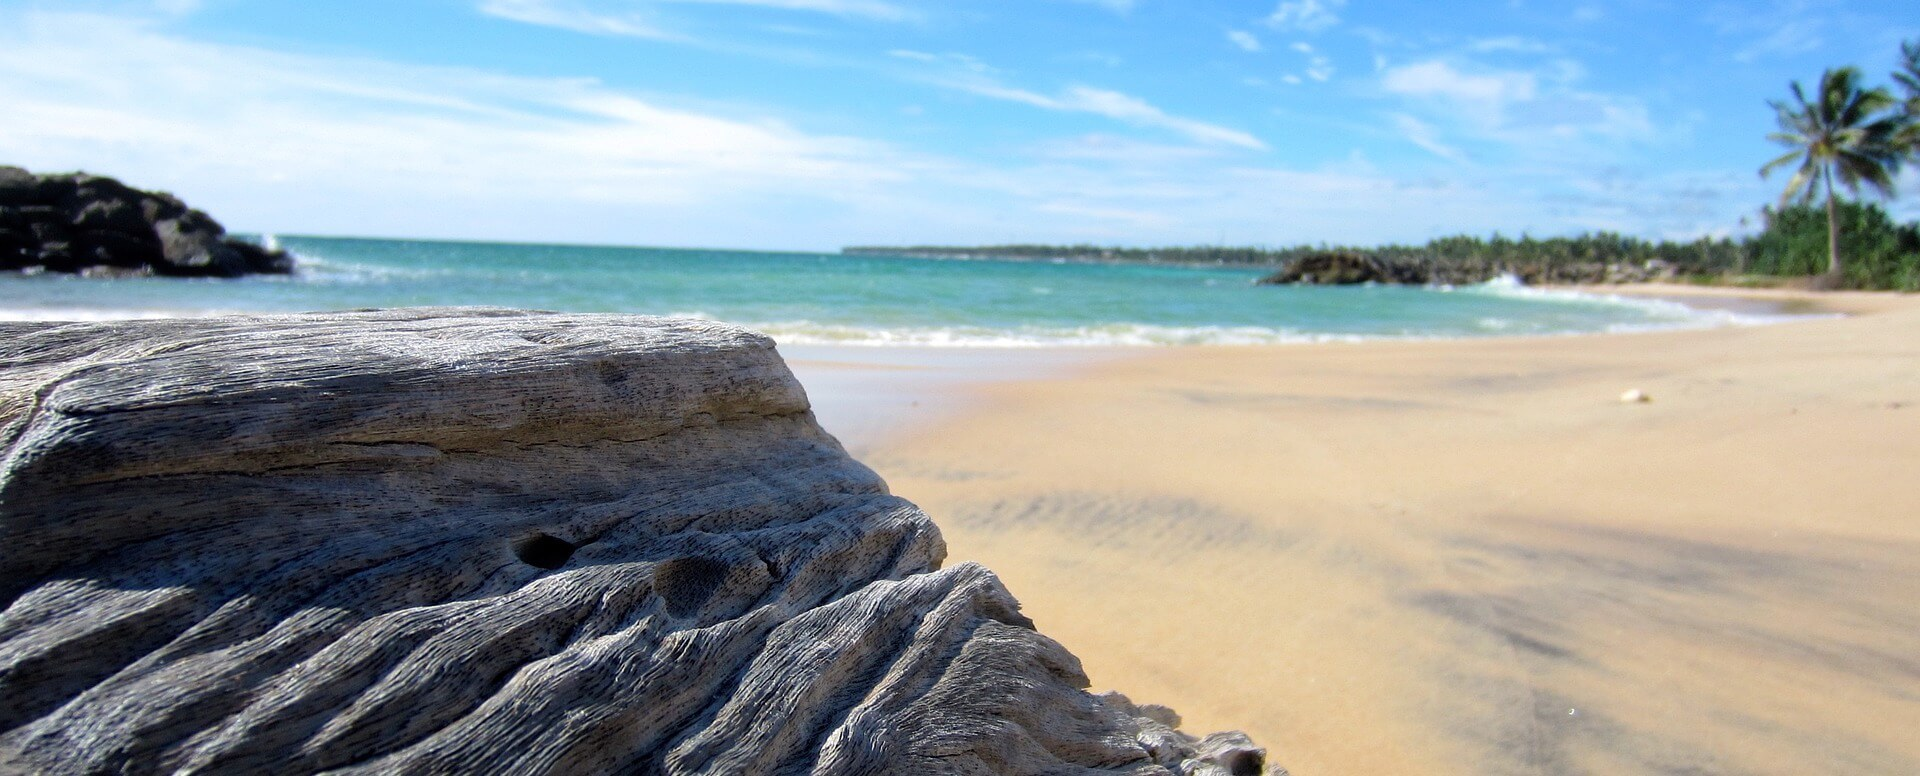 6. Allow yourself moments of lazing on a beautiful beach - Sri Lanka